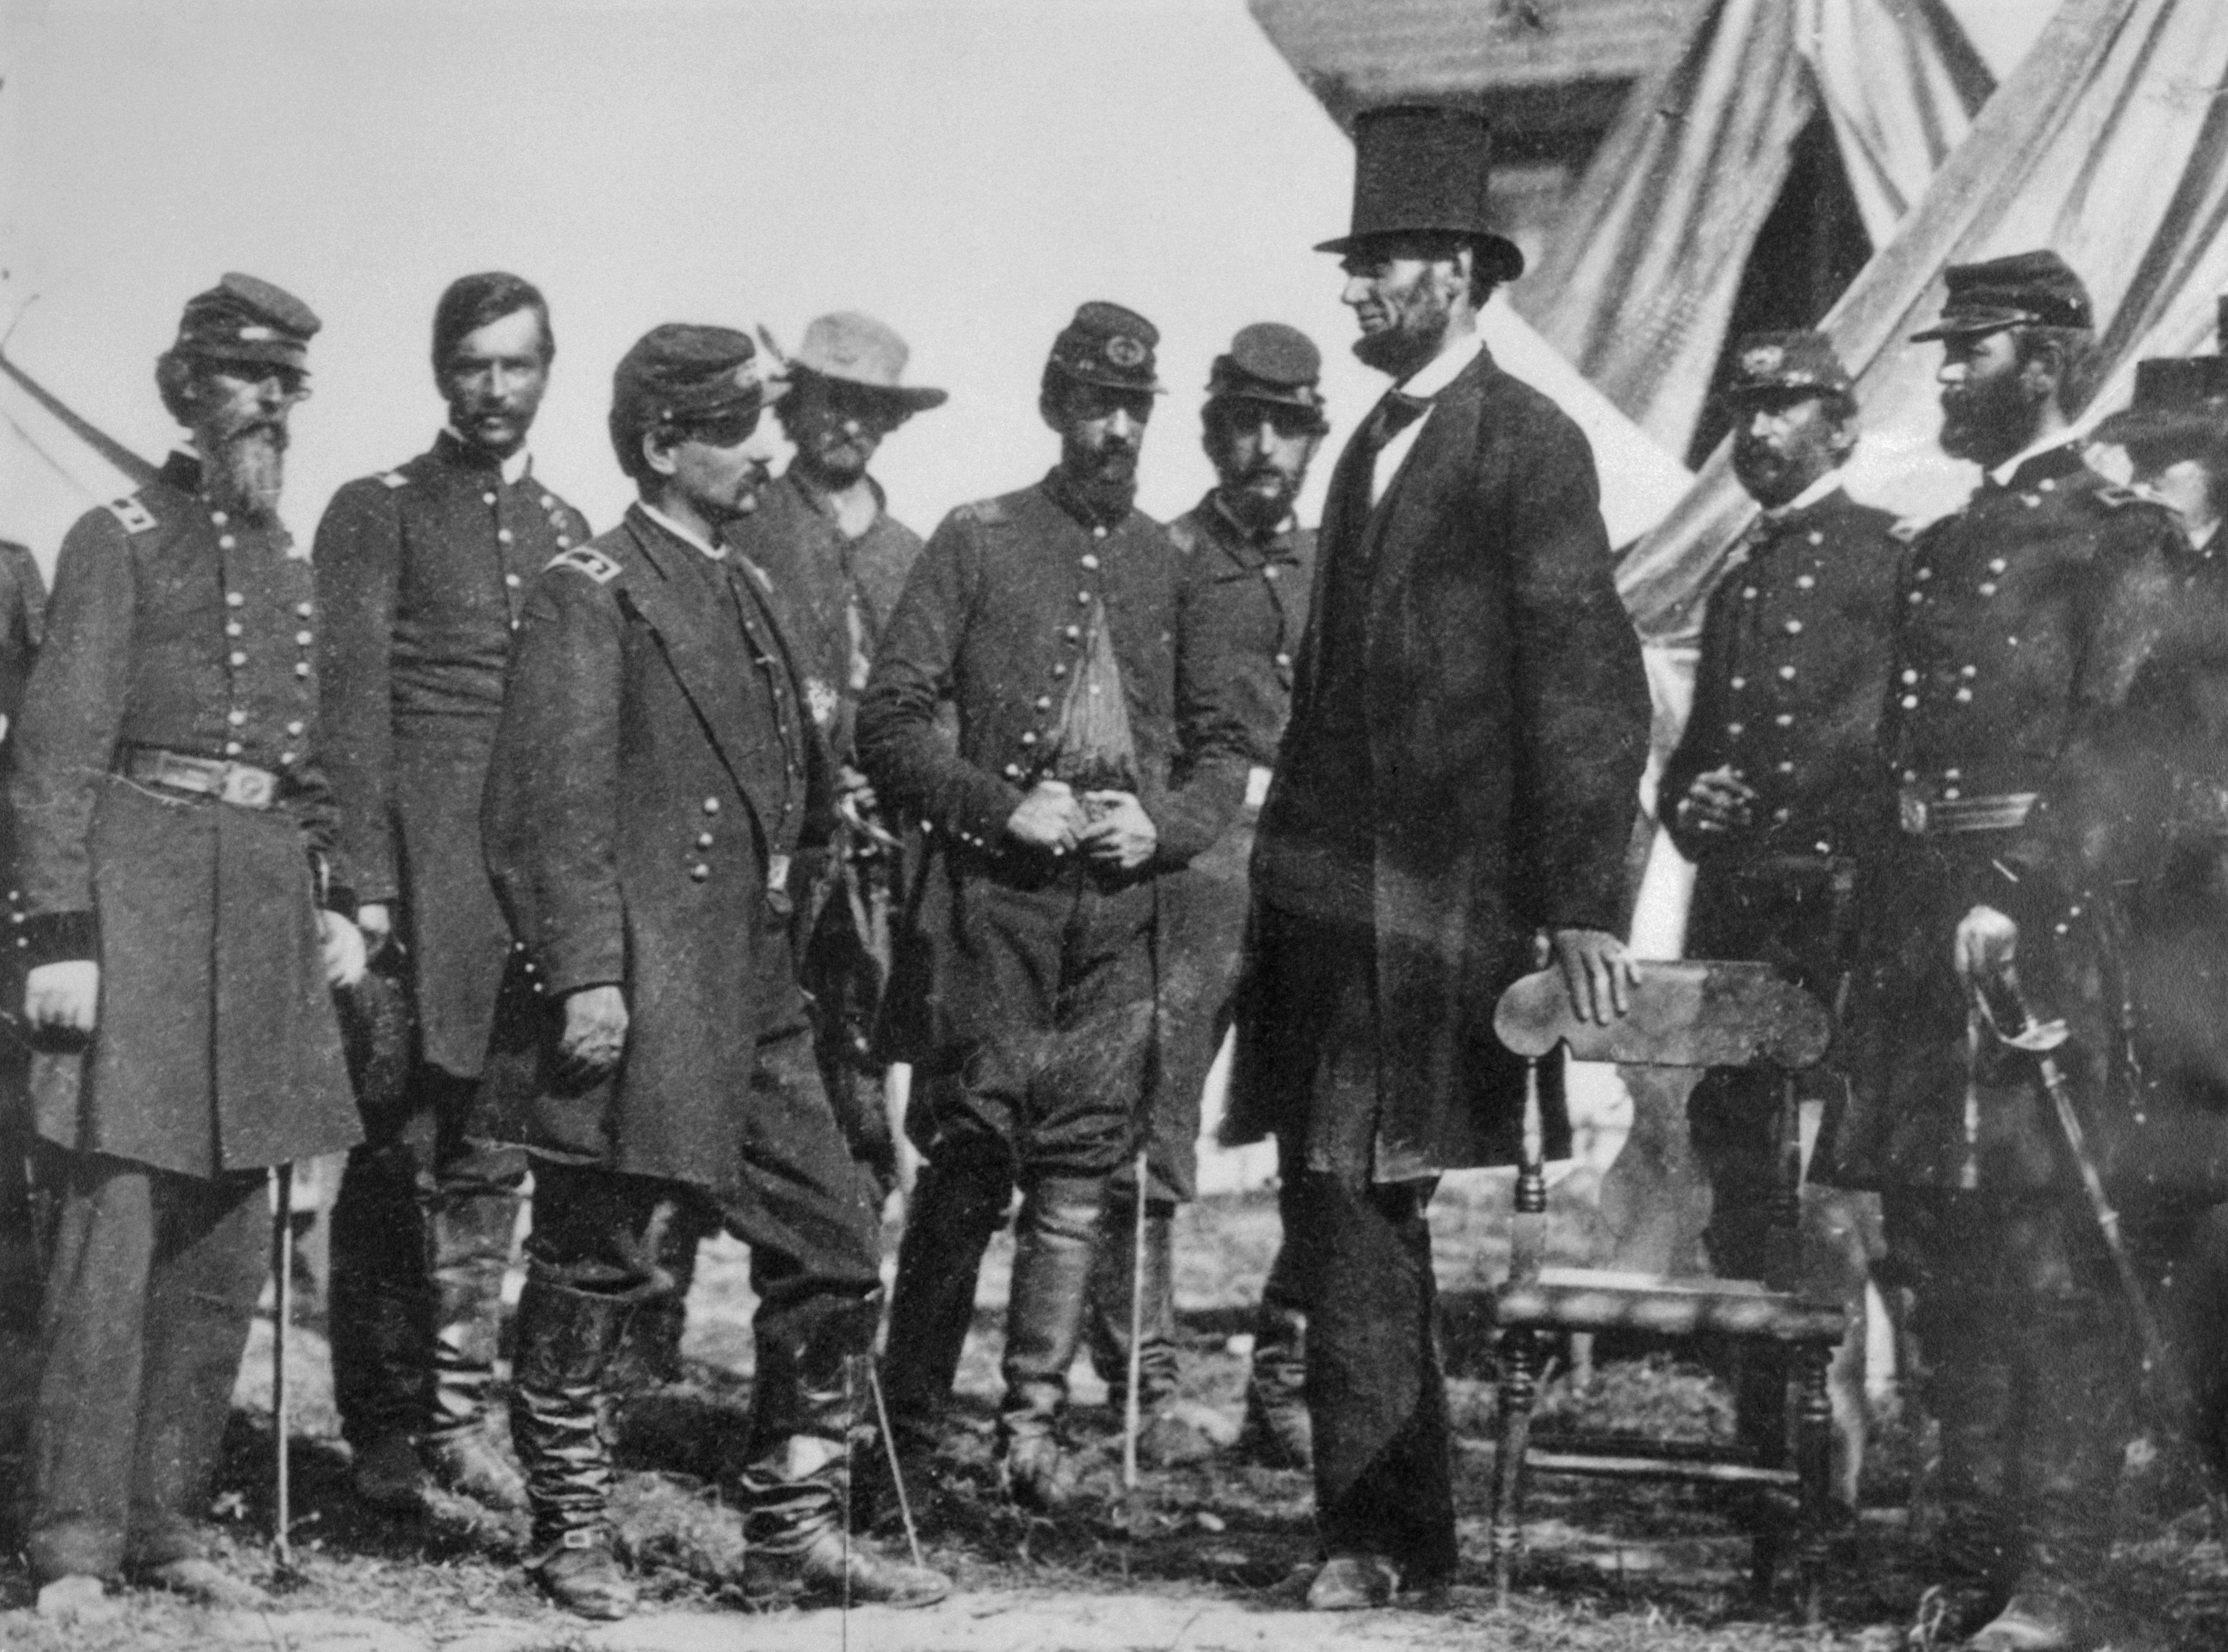 Abraham Lincoln with Civil War generals.